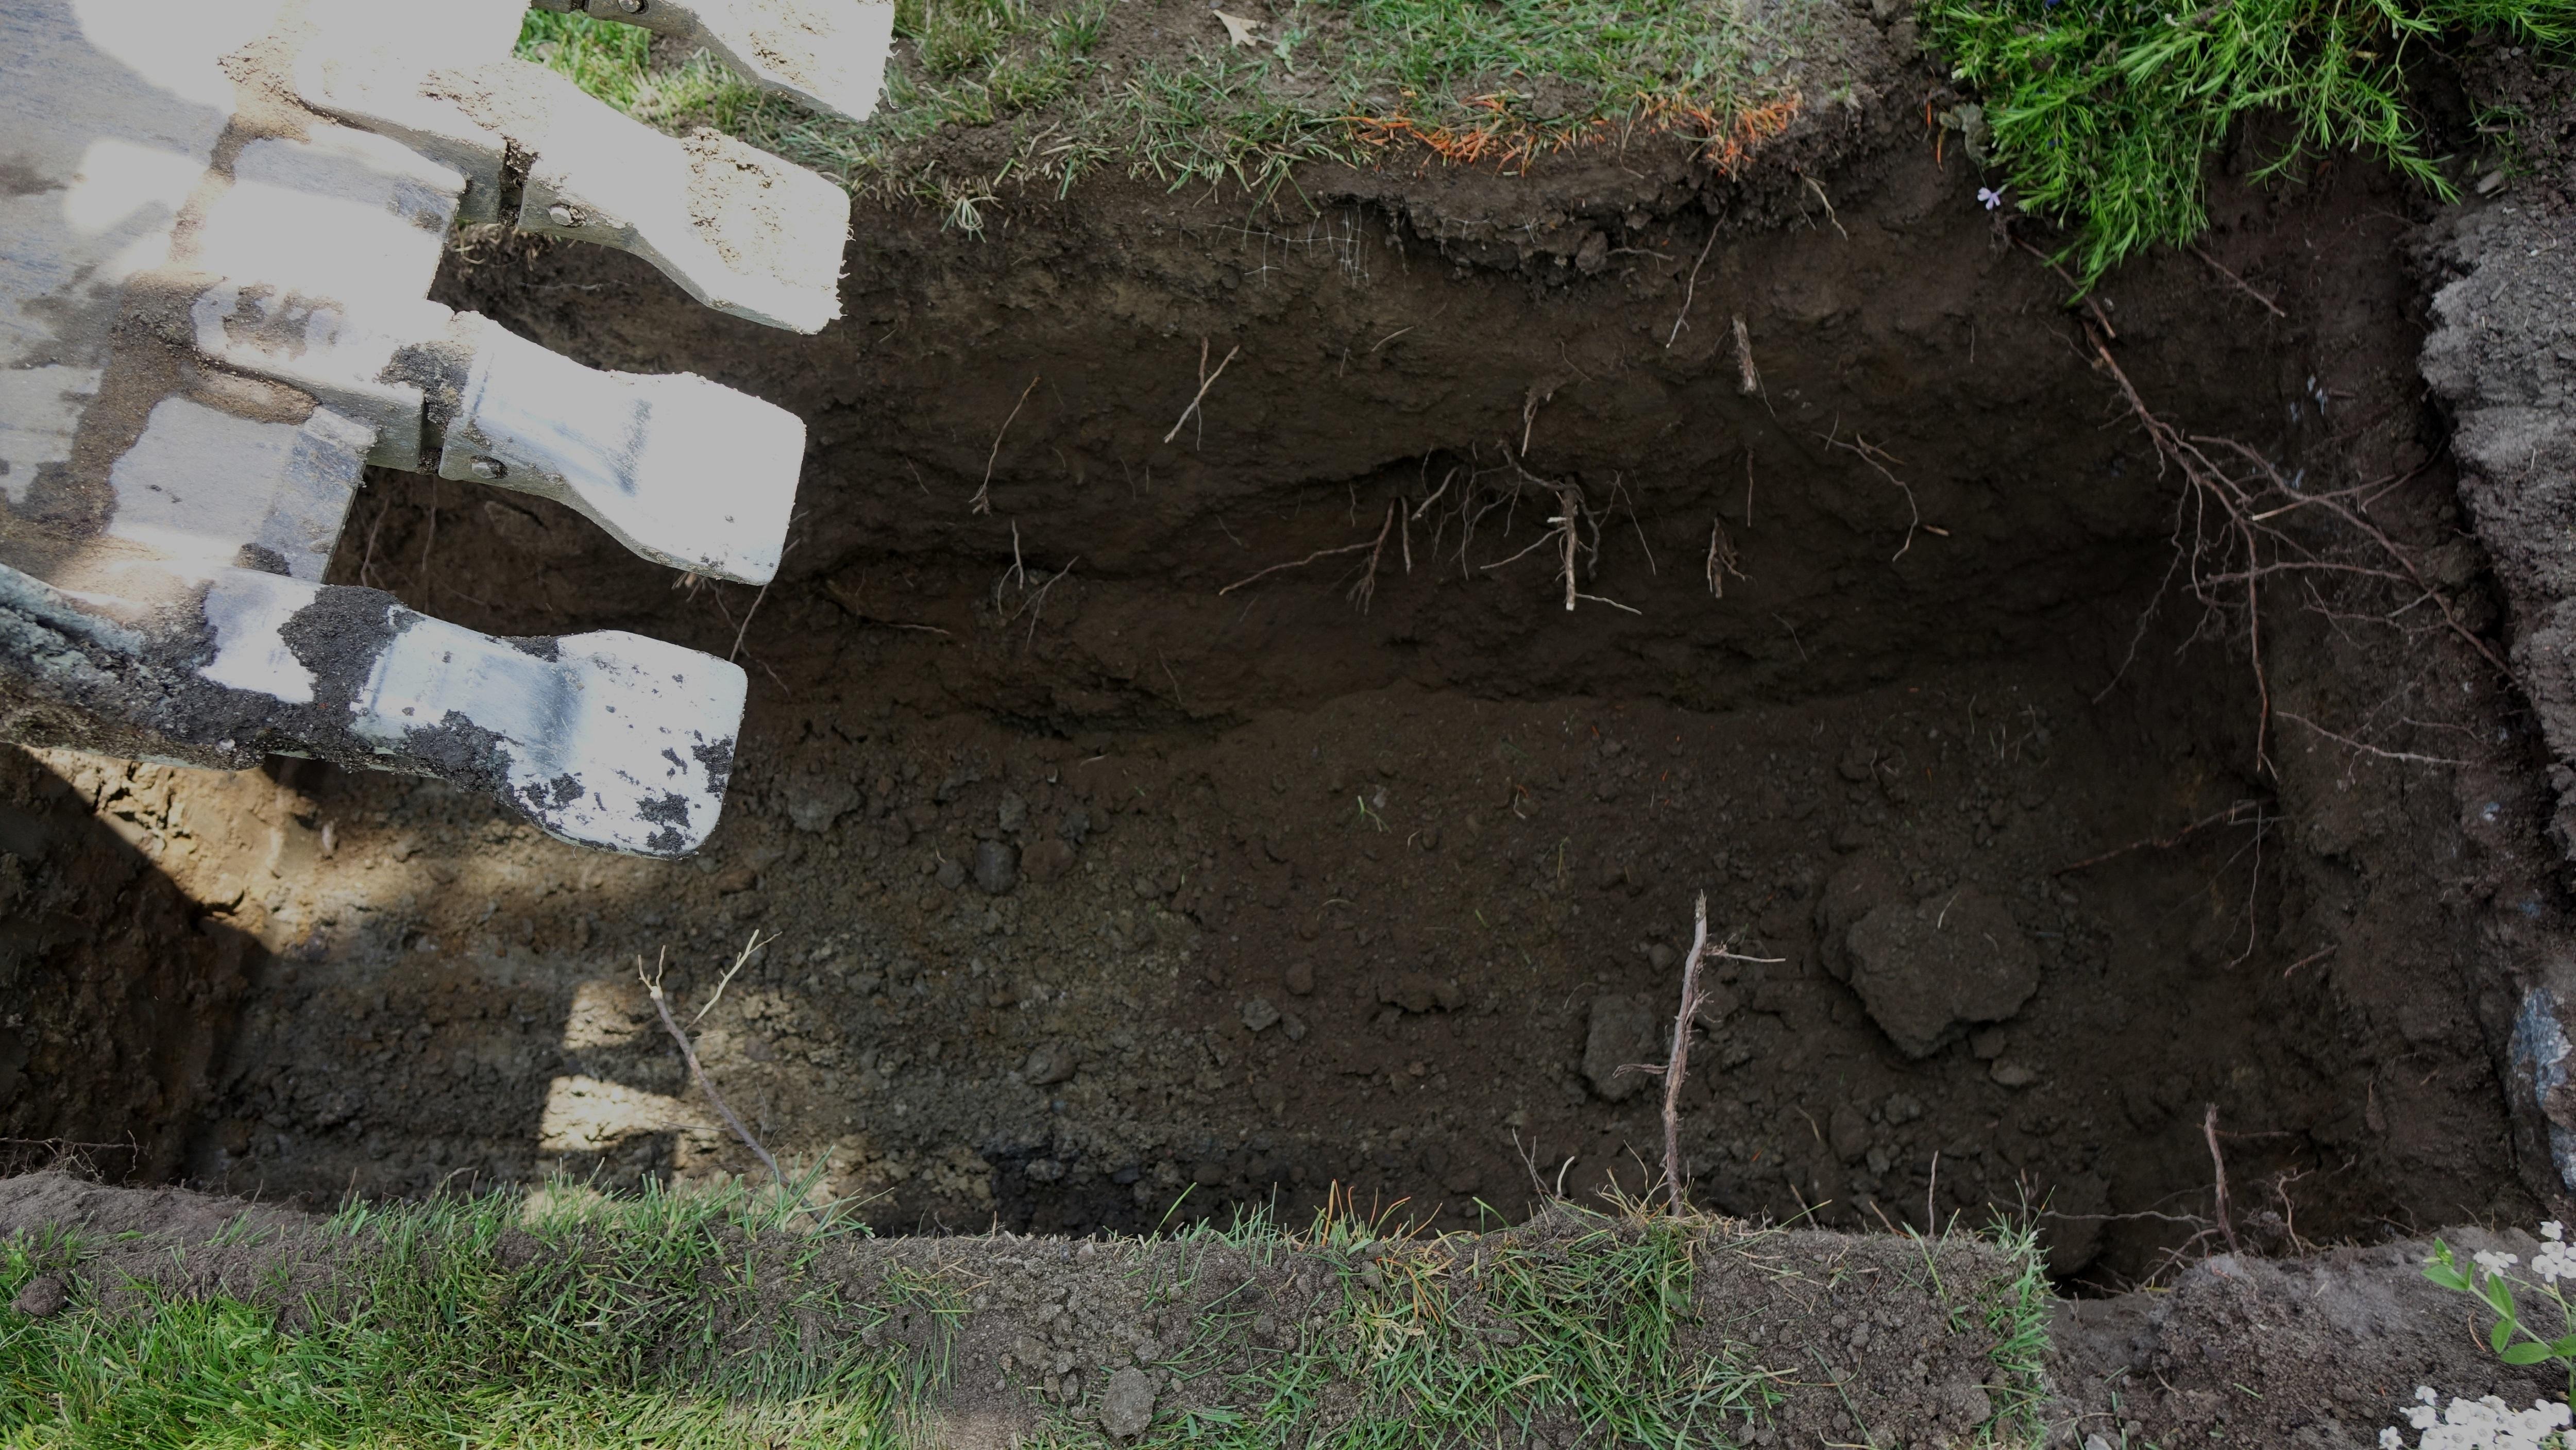 A partially dug grave at Beechwood Cemetery. (Miriam Katawazi/CBC)